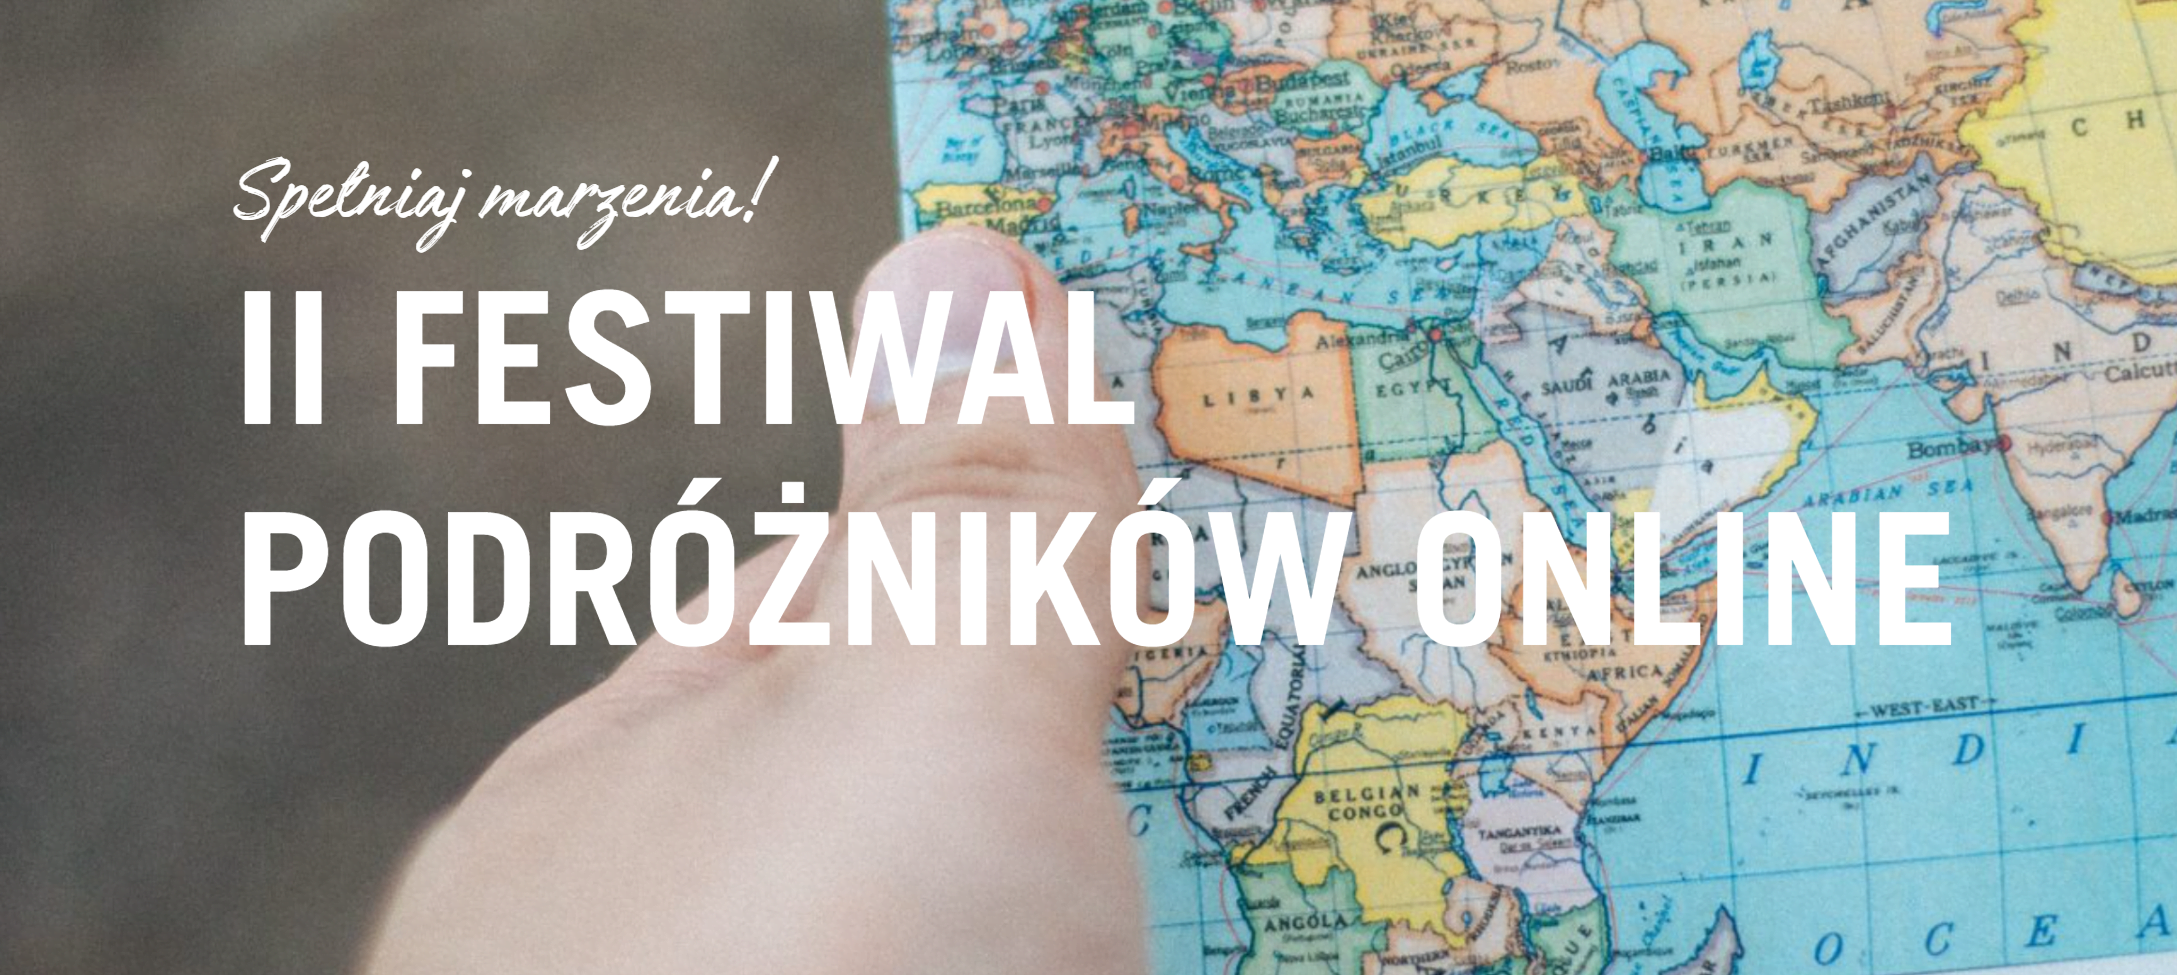 II Festiwal Podróżników Online